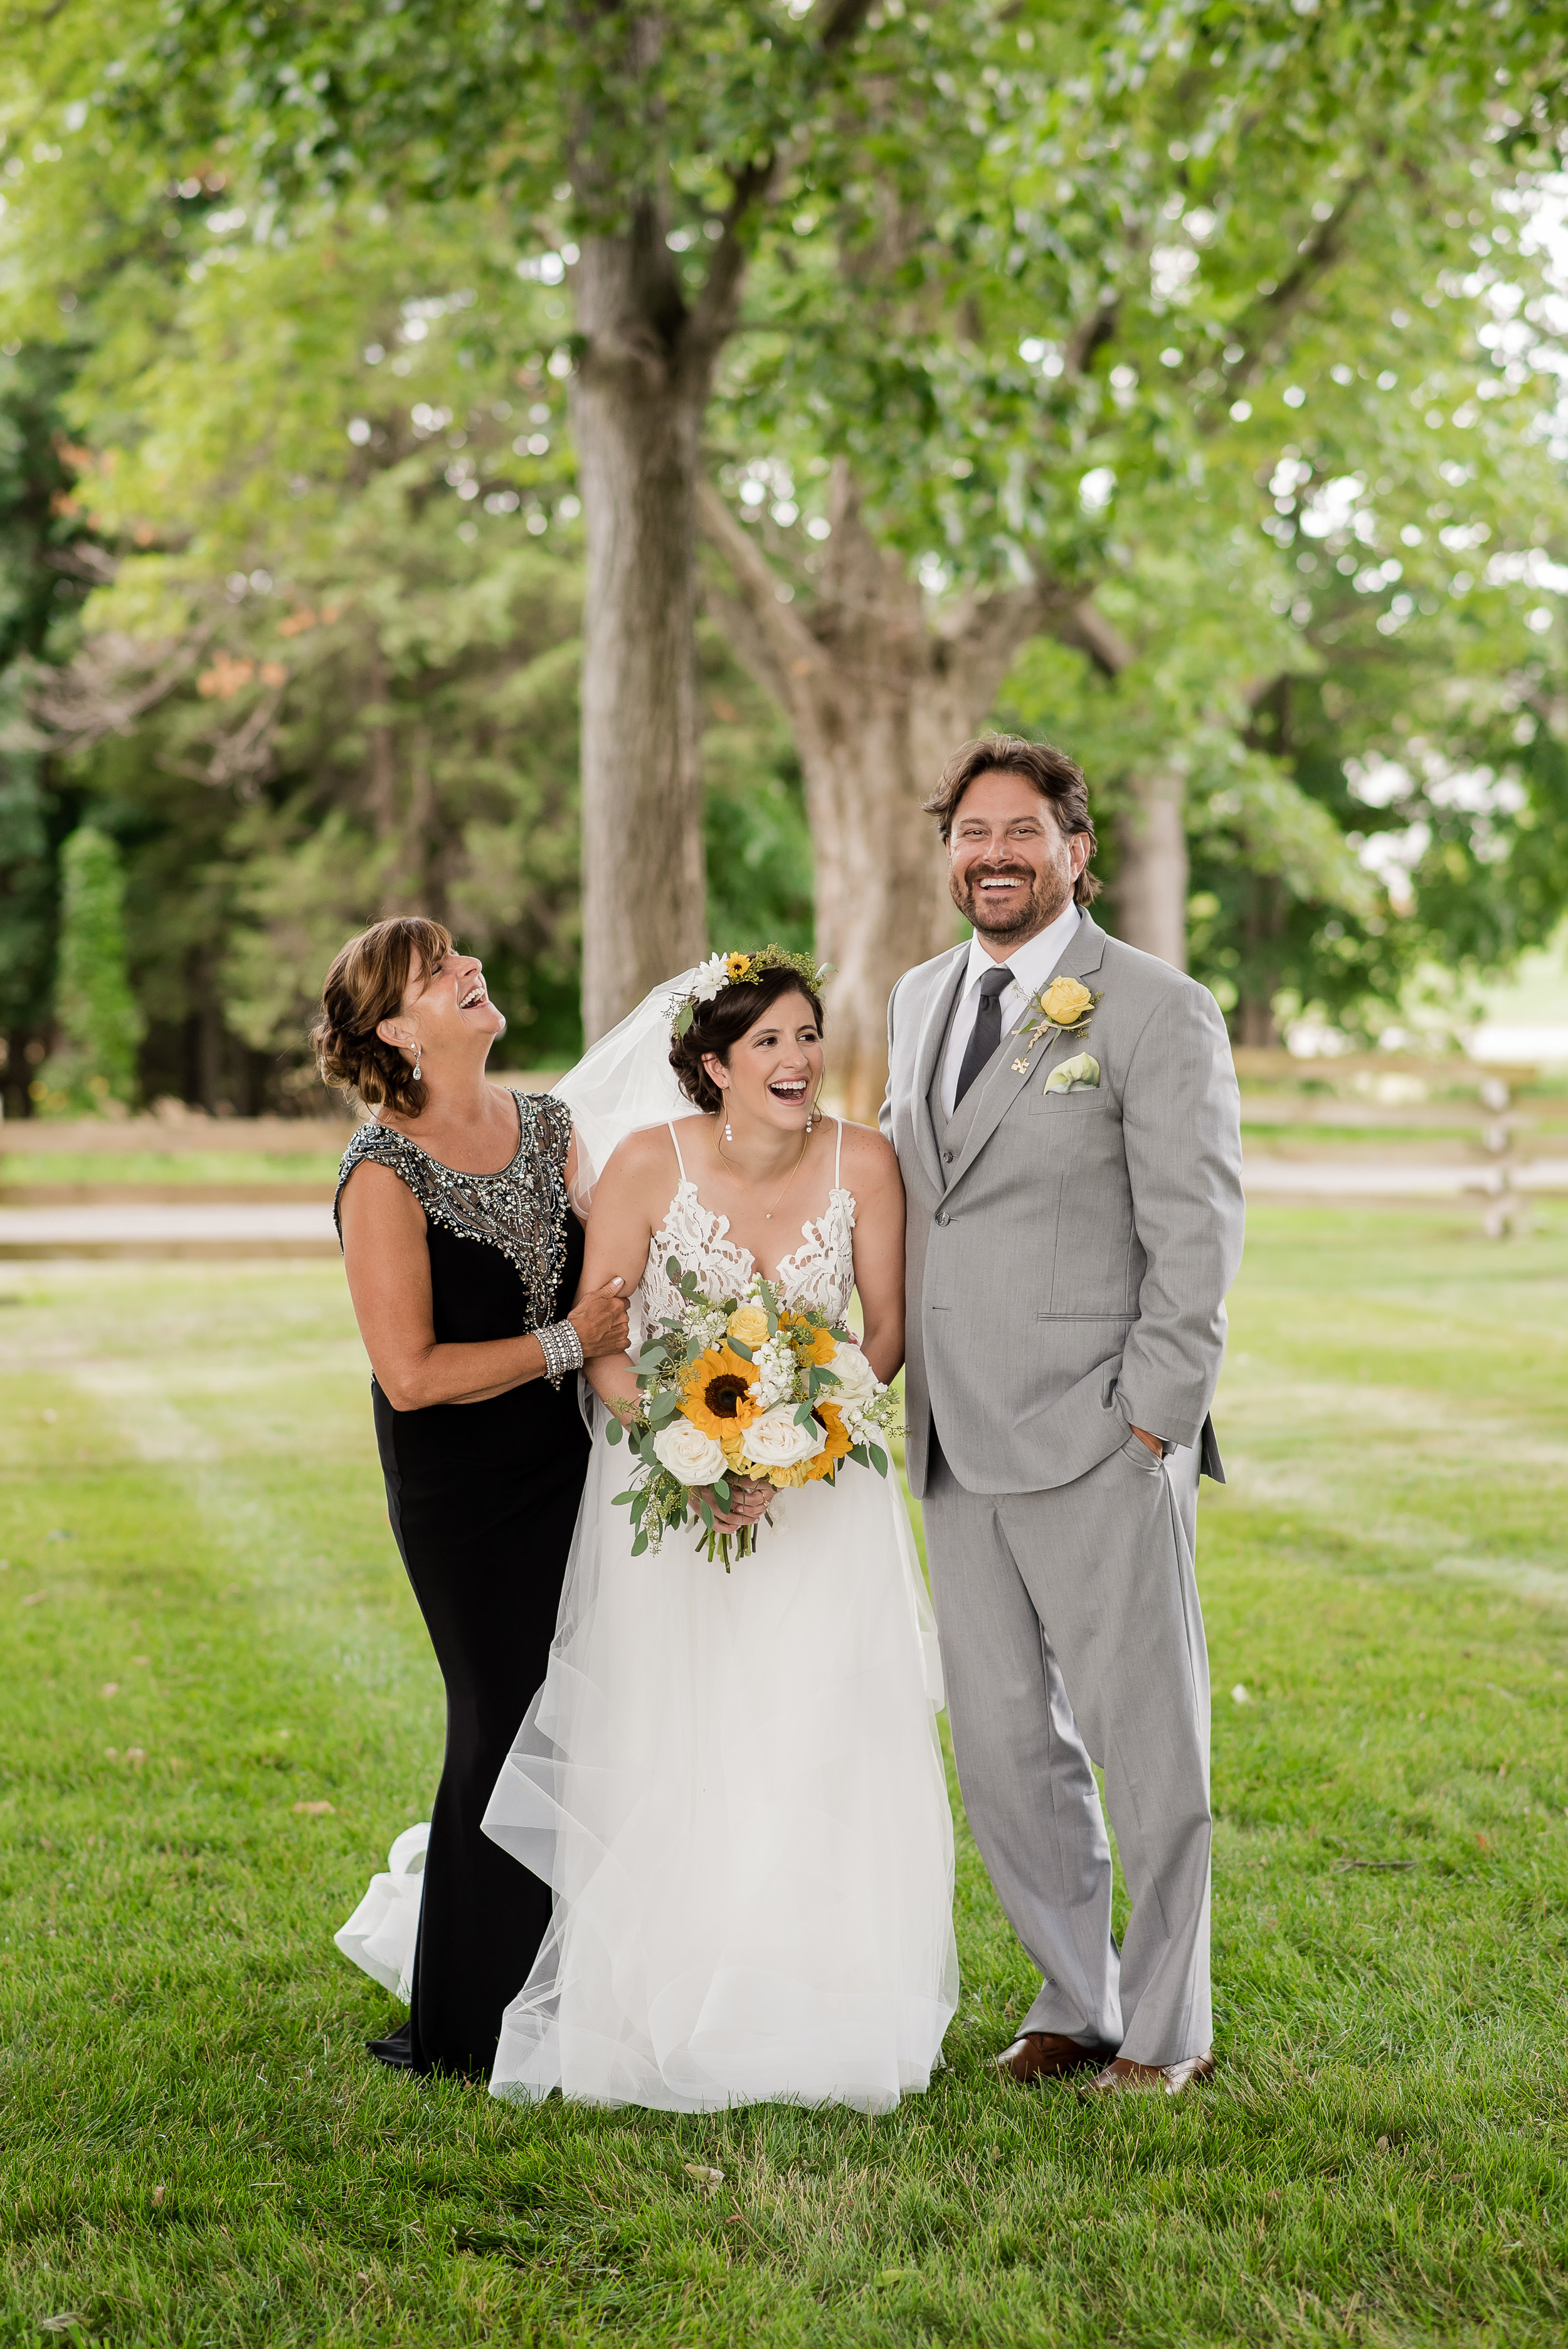 Cornman Farms Summer Wedding